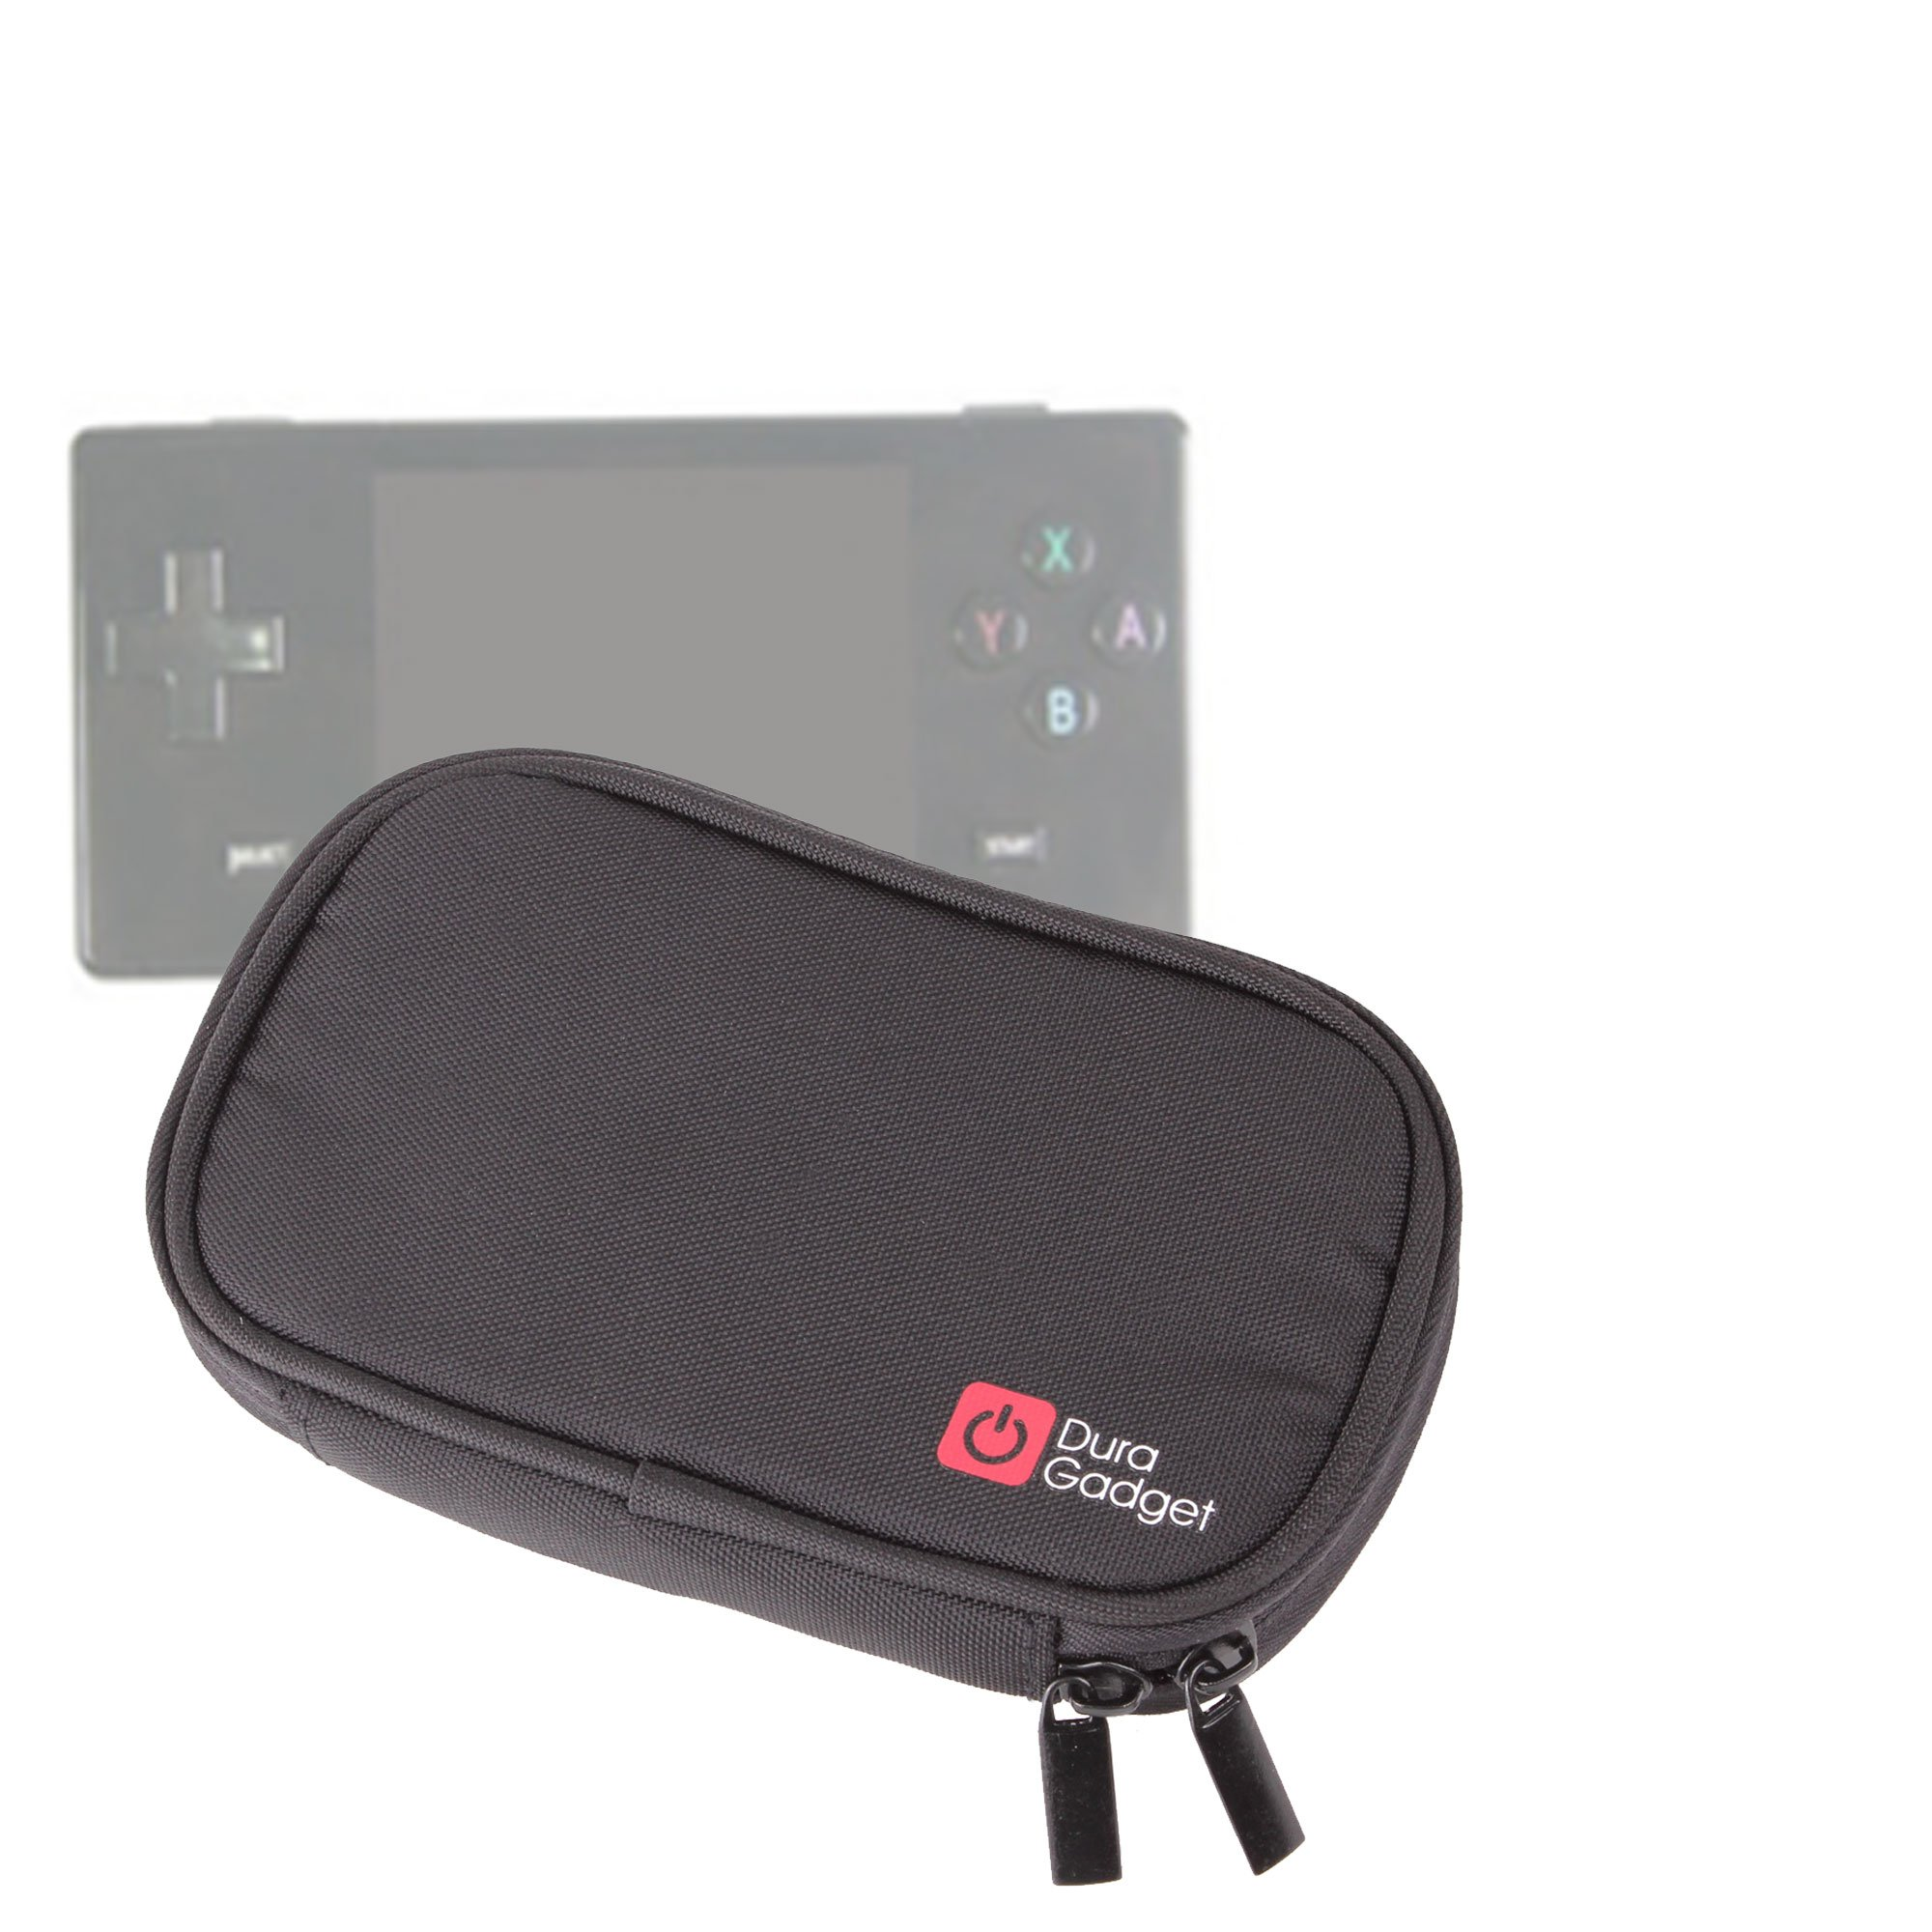 DURAGADGET Handy Dingoo Games Console Case - Premium Quality Water Resistant Memory Foam Travel Case with Dual Zips -s & Belt Loop for Dingoo A320, Dingoo A380 & Dingoo Gemei A330